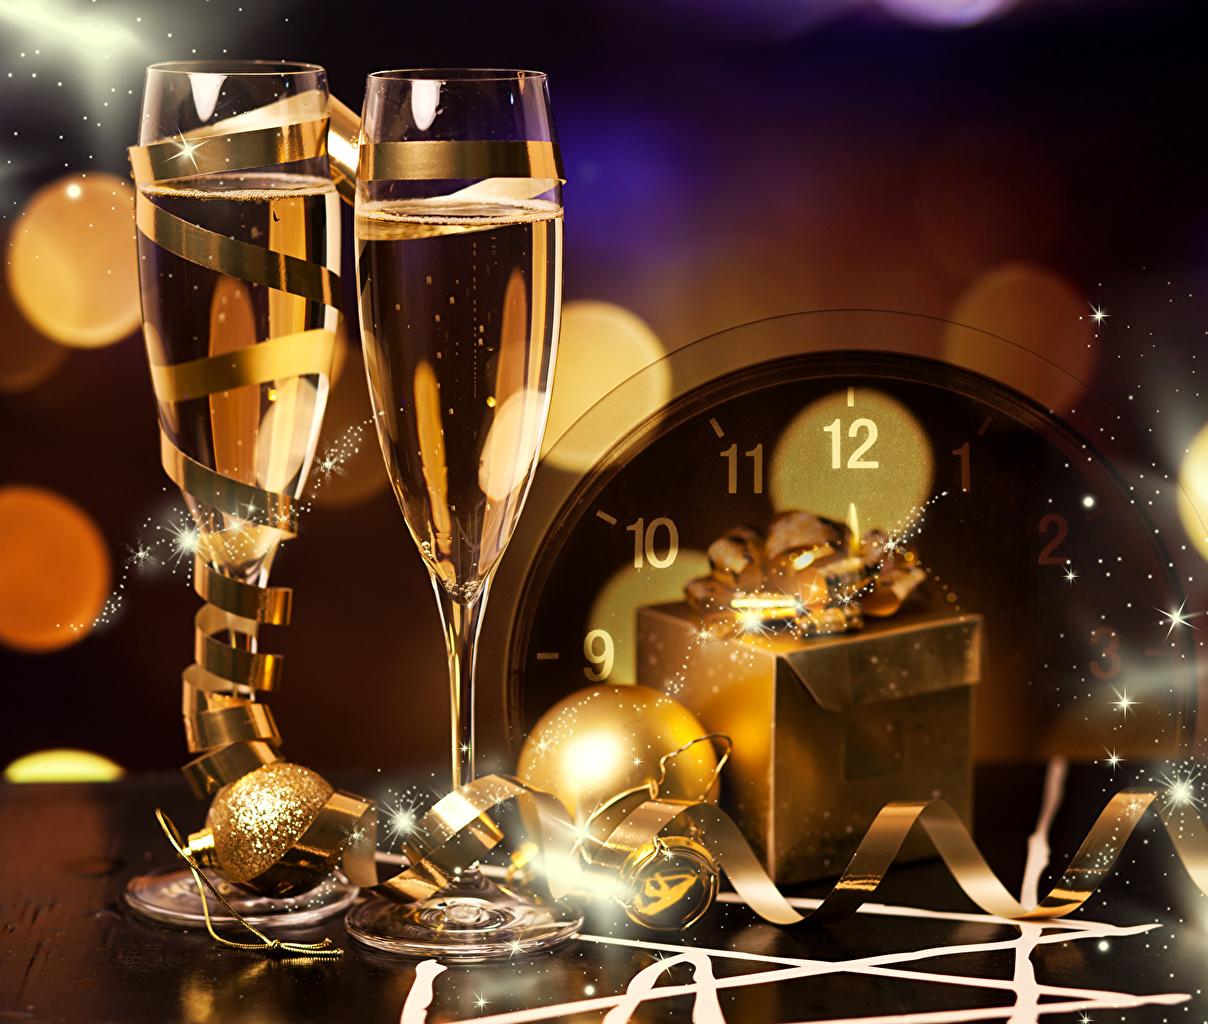 Photo Christmas Champagne present Food Balls Ribbon Stemware Holidays New year Sparkling wine Gifts